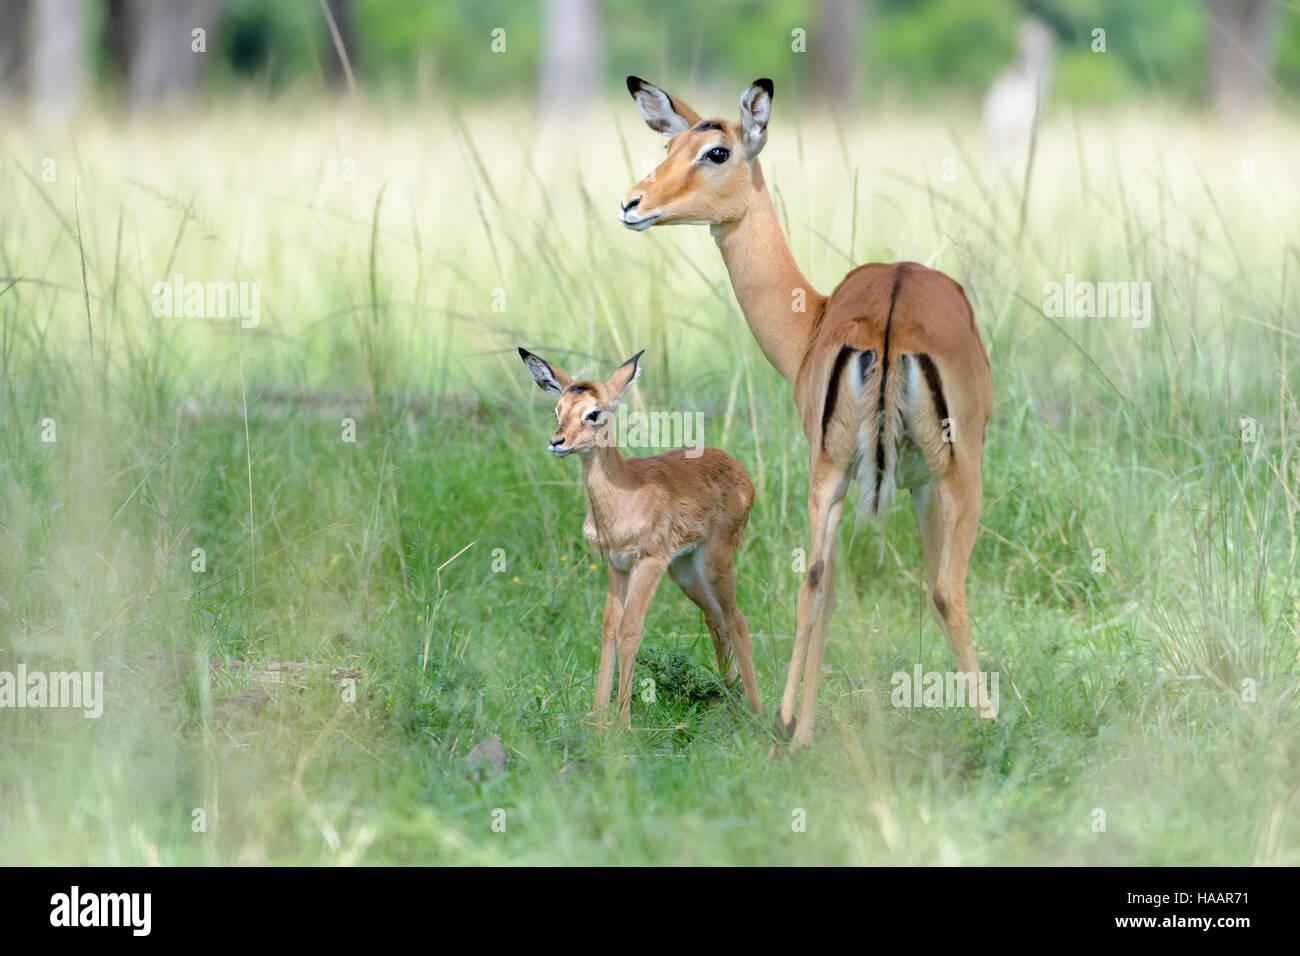 Impala (Aepyceros melampus) mother and new born infant, baby, Maasai Mara National Reserve, Kenya - Stock Image